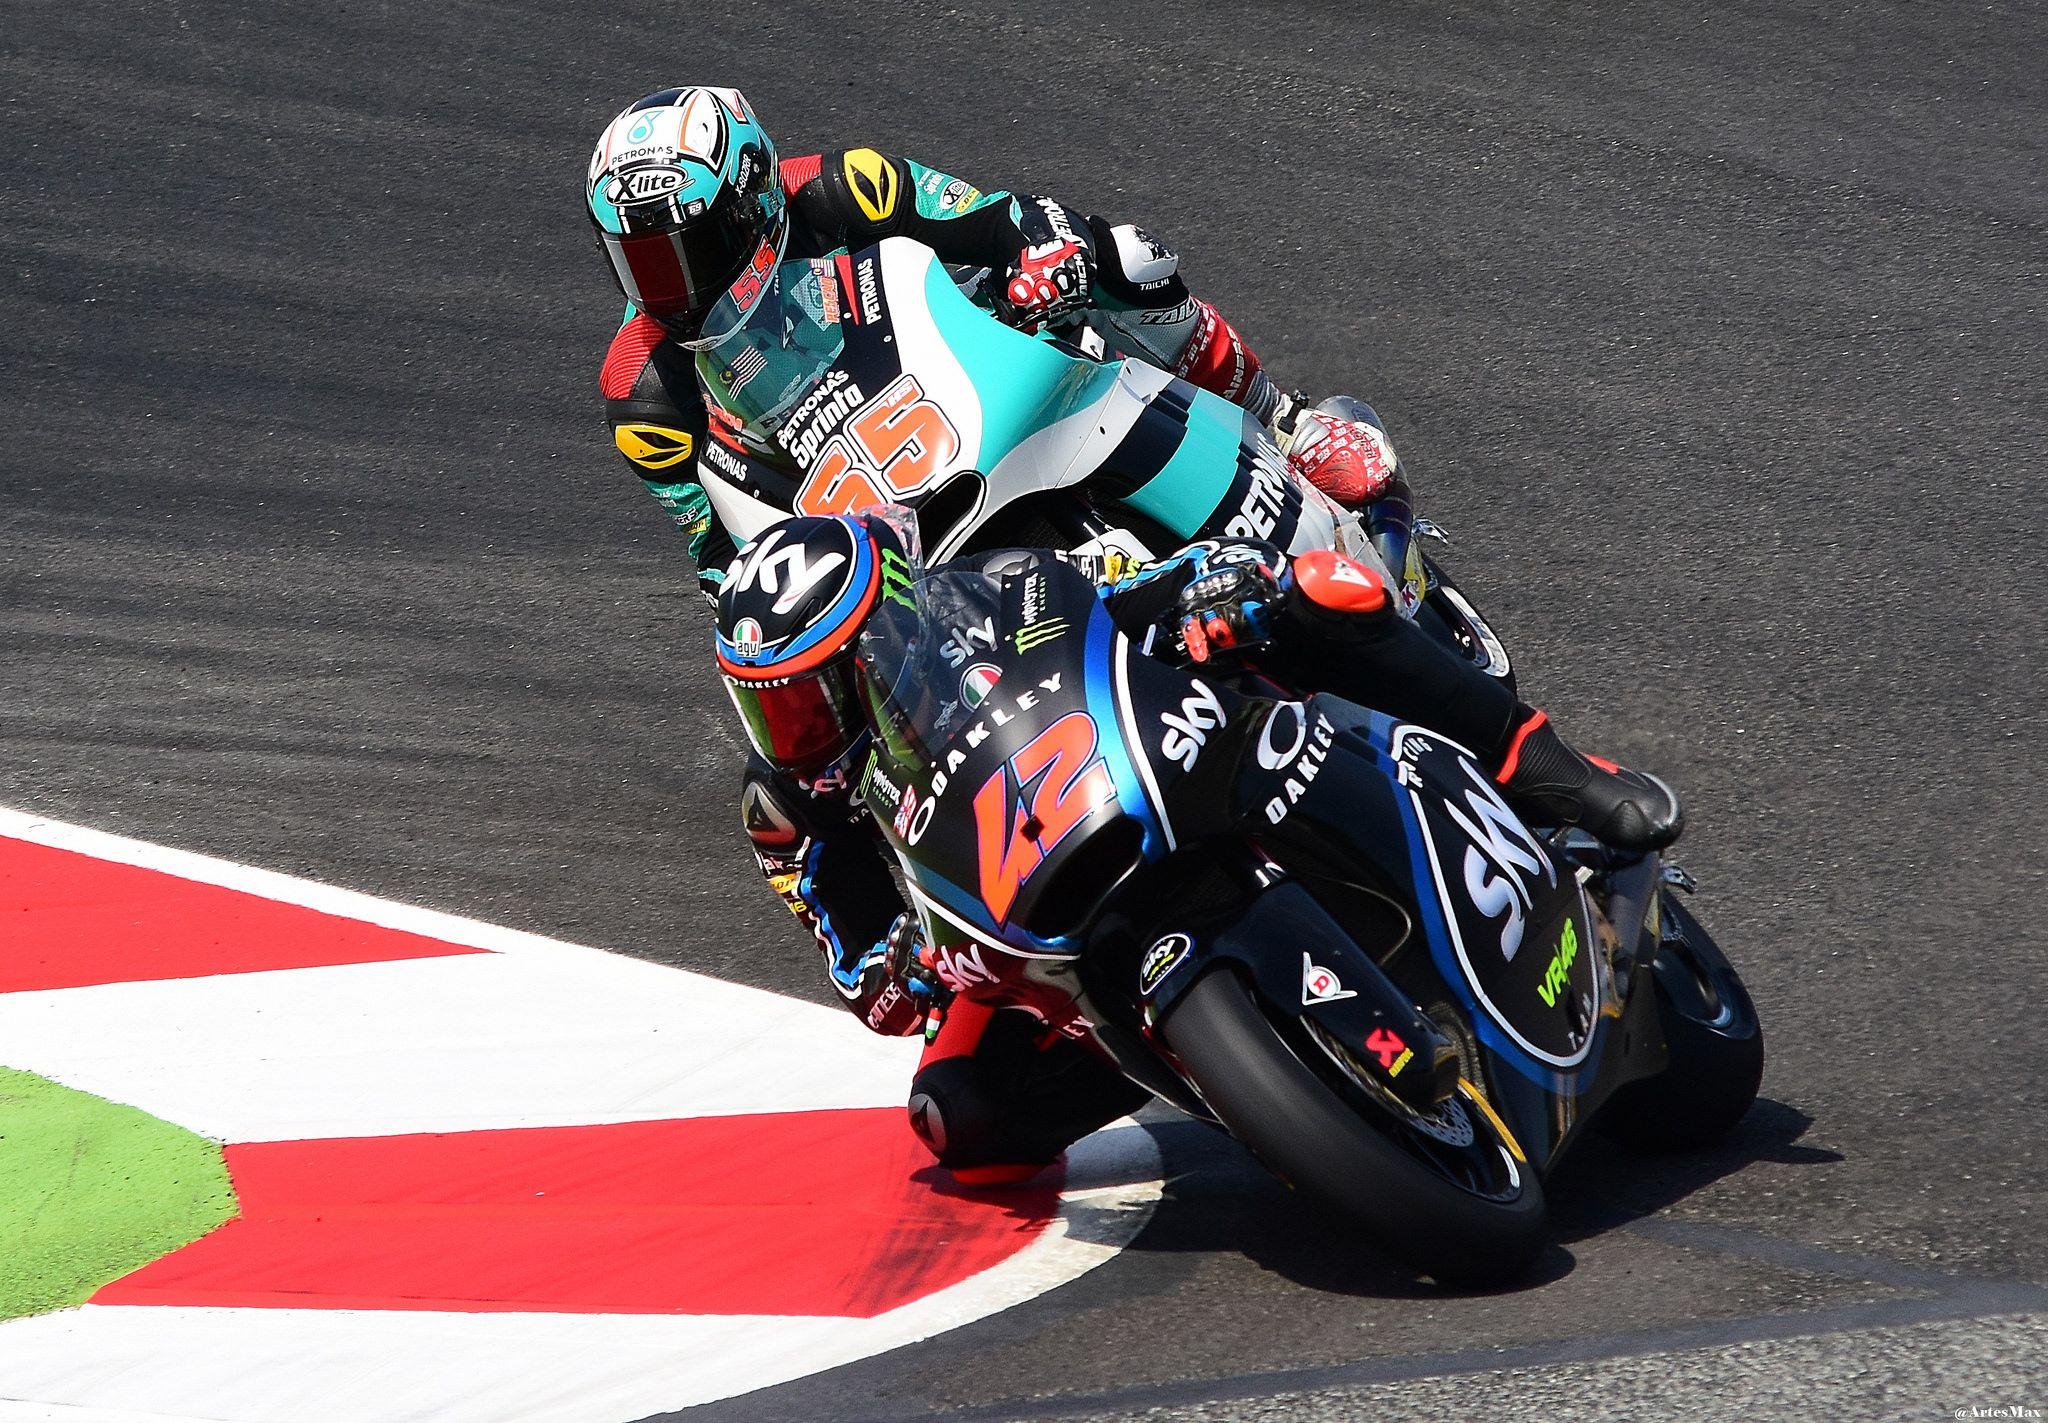 Kalex Francesco Bagnaia Ita Sky Racing Team Vr46 Racing Team Racing Vr46